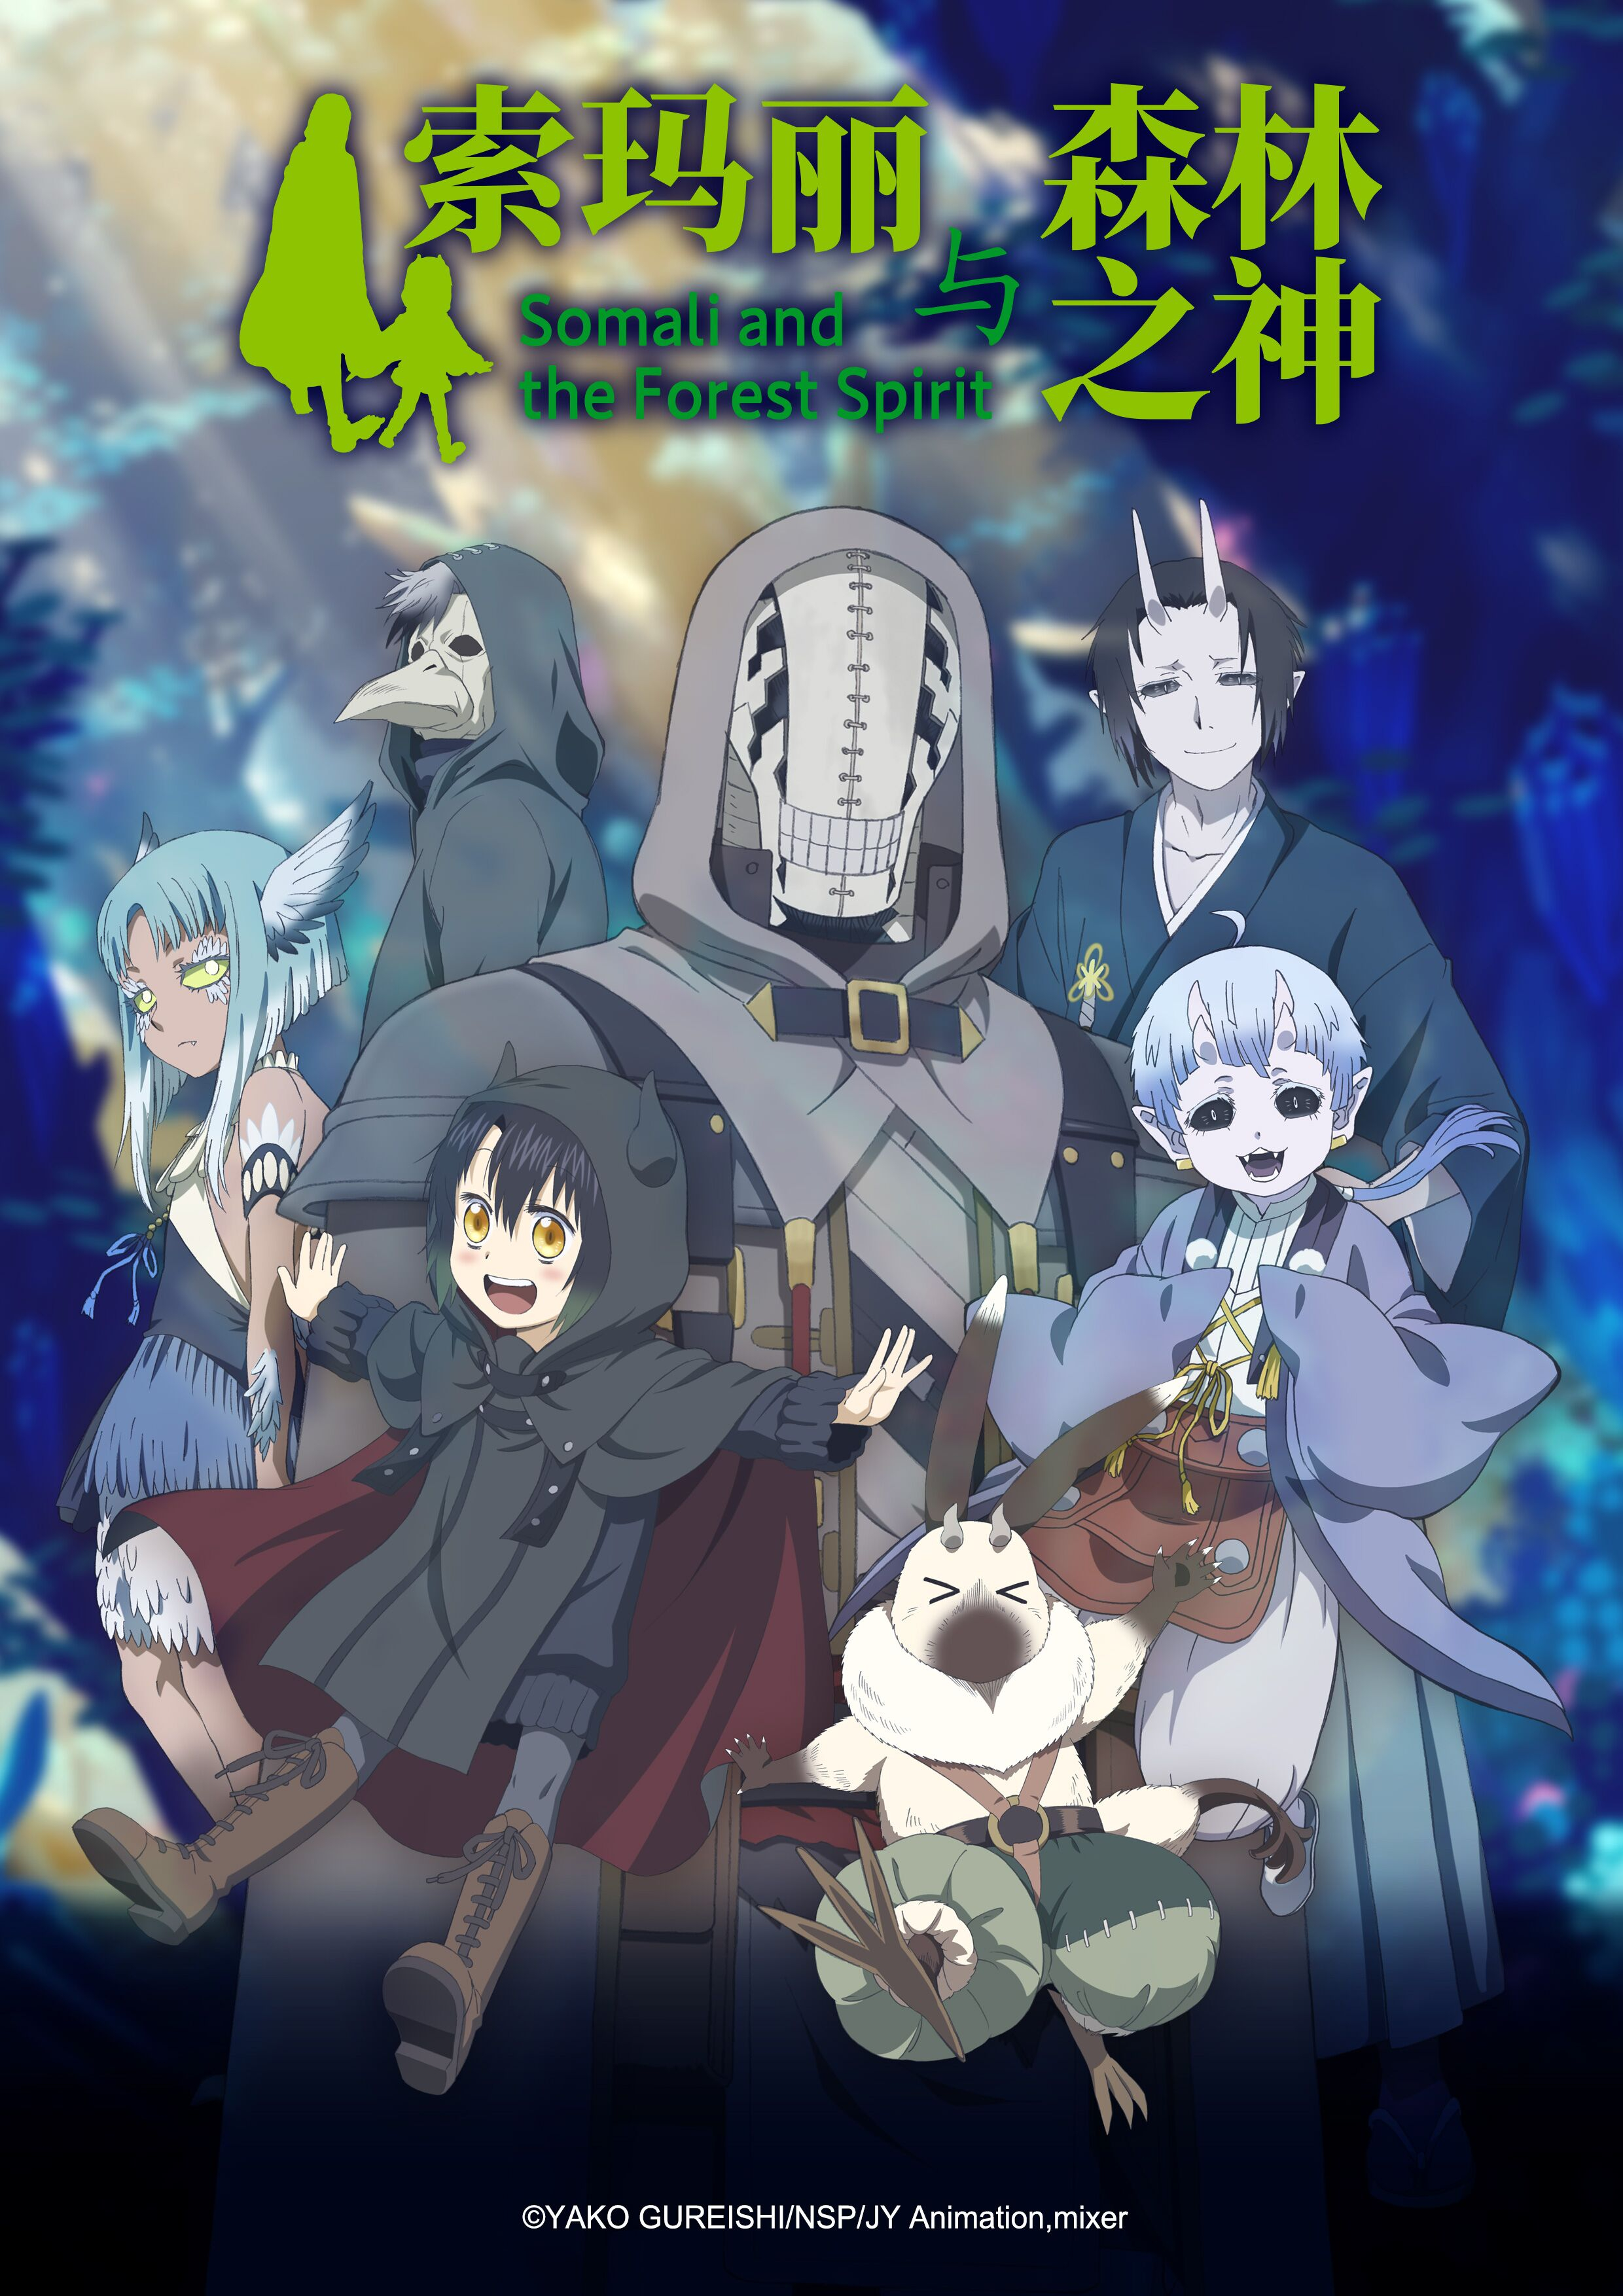 TV动画《索玛丽与森林之神》最新PV与海报公开,2020年1月开播- ACG17.COM